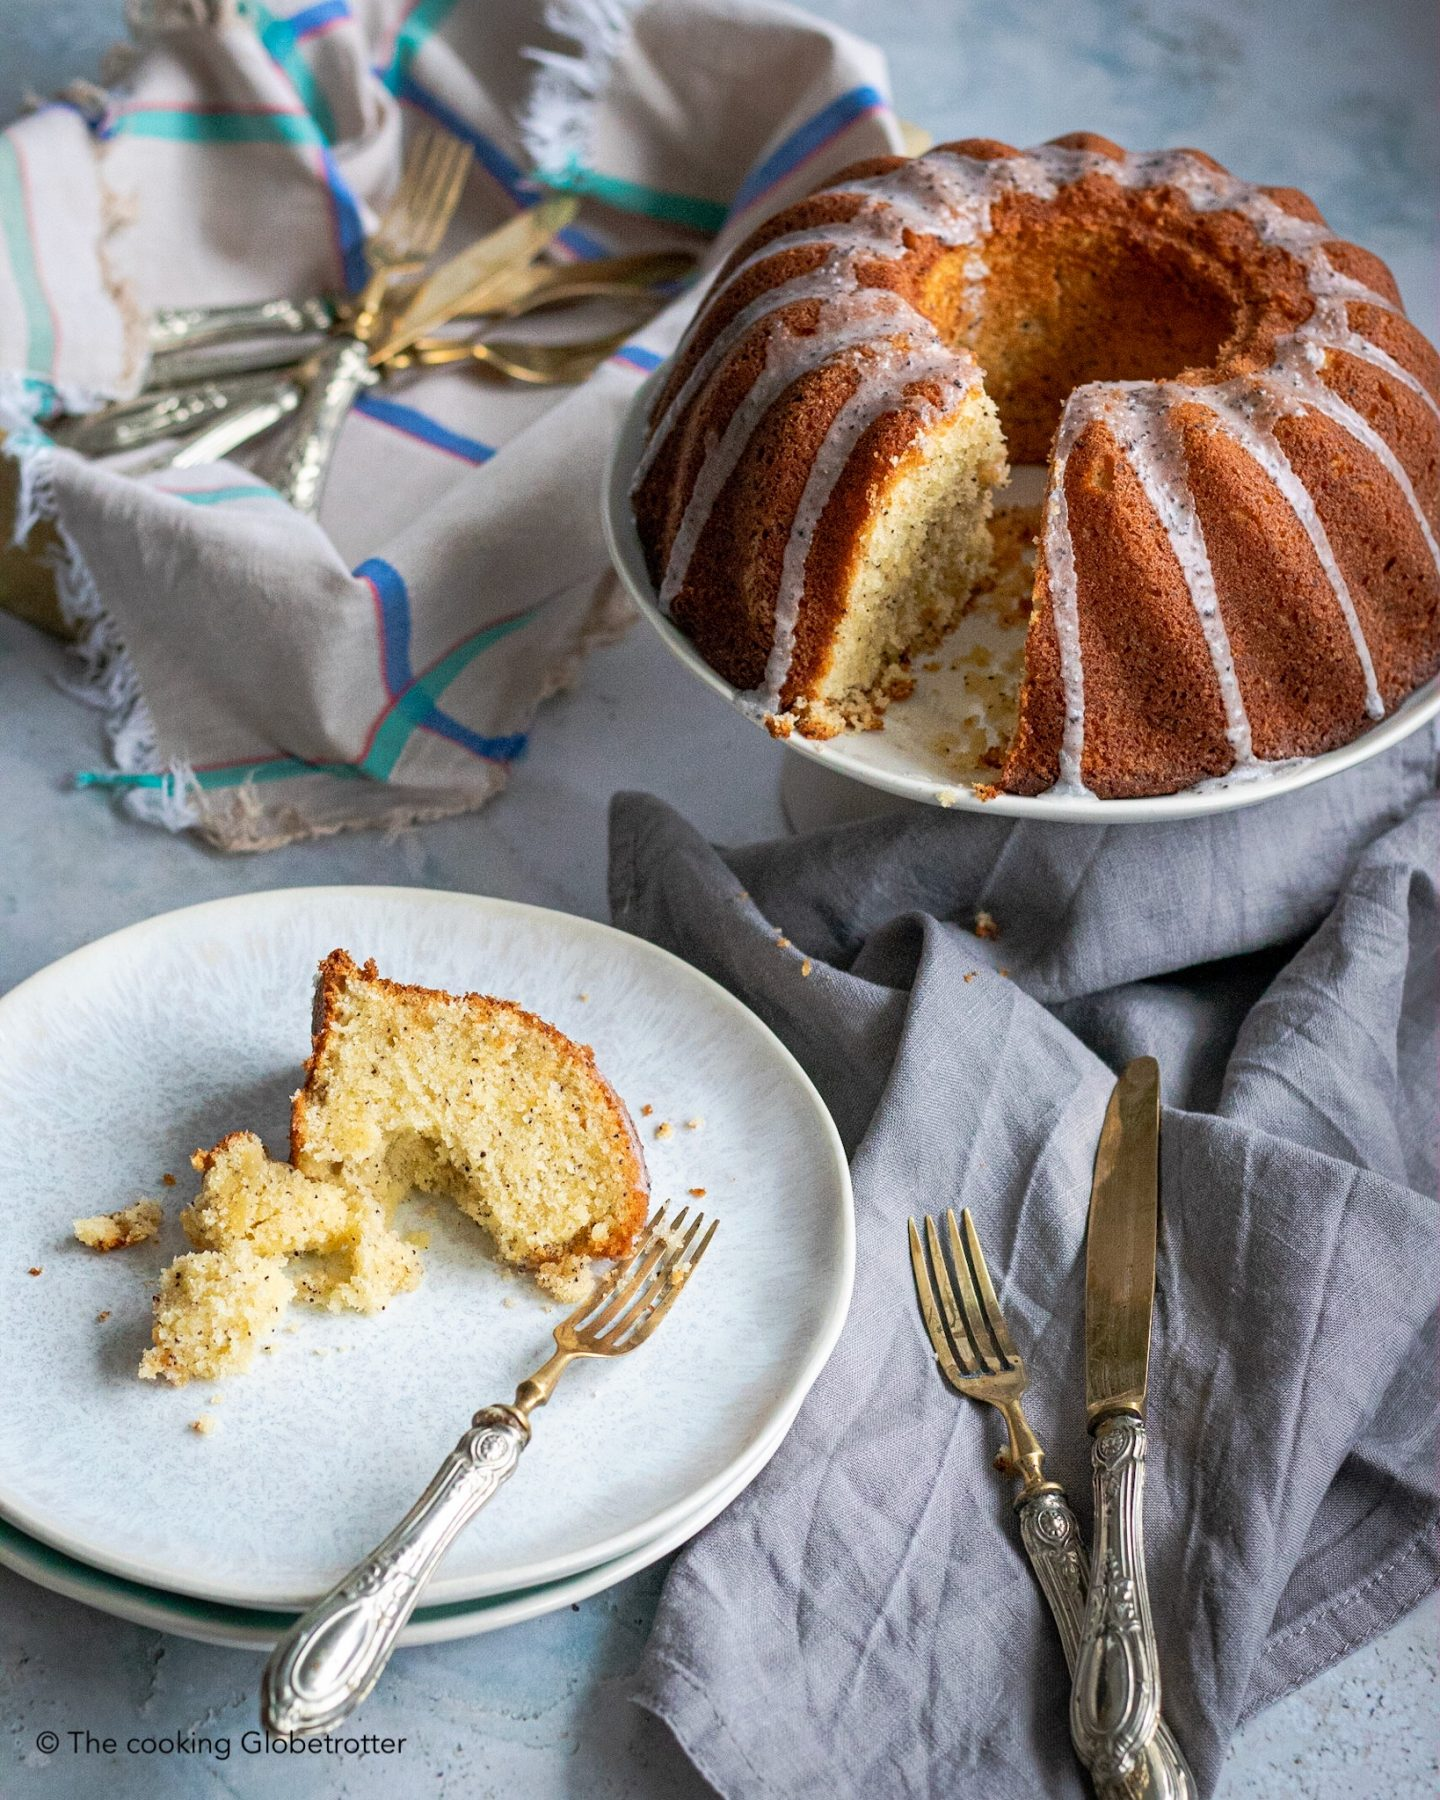 Index featured lemon poppy seeds cake lemon glaze juicy moist Guglhupf zoner photo studio